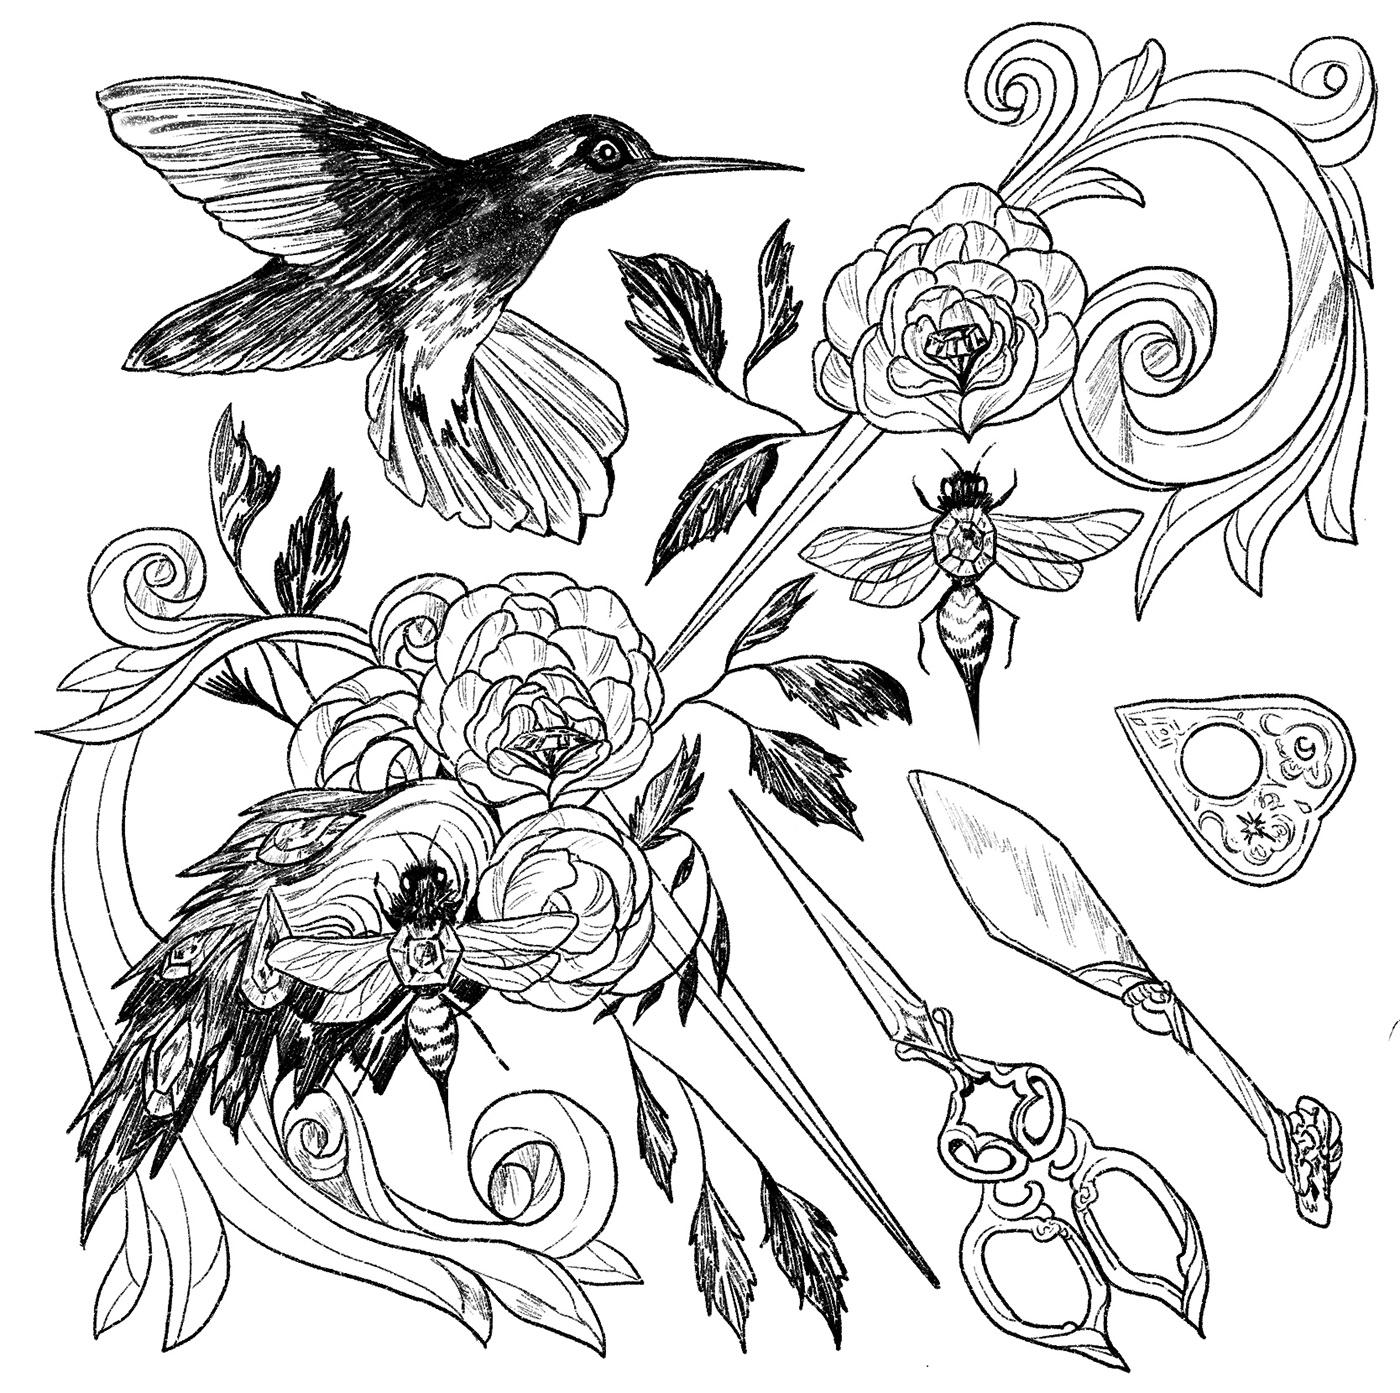 Procreate tattoo line drawing Pencil drawing ink drawing inktober inktober2019 Drawing  Figure Drawing